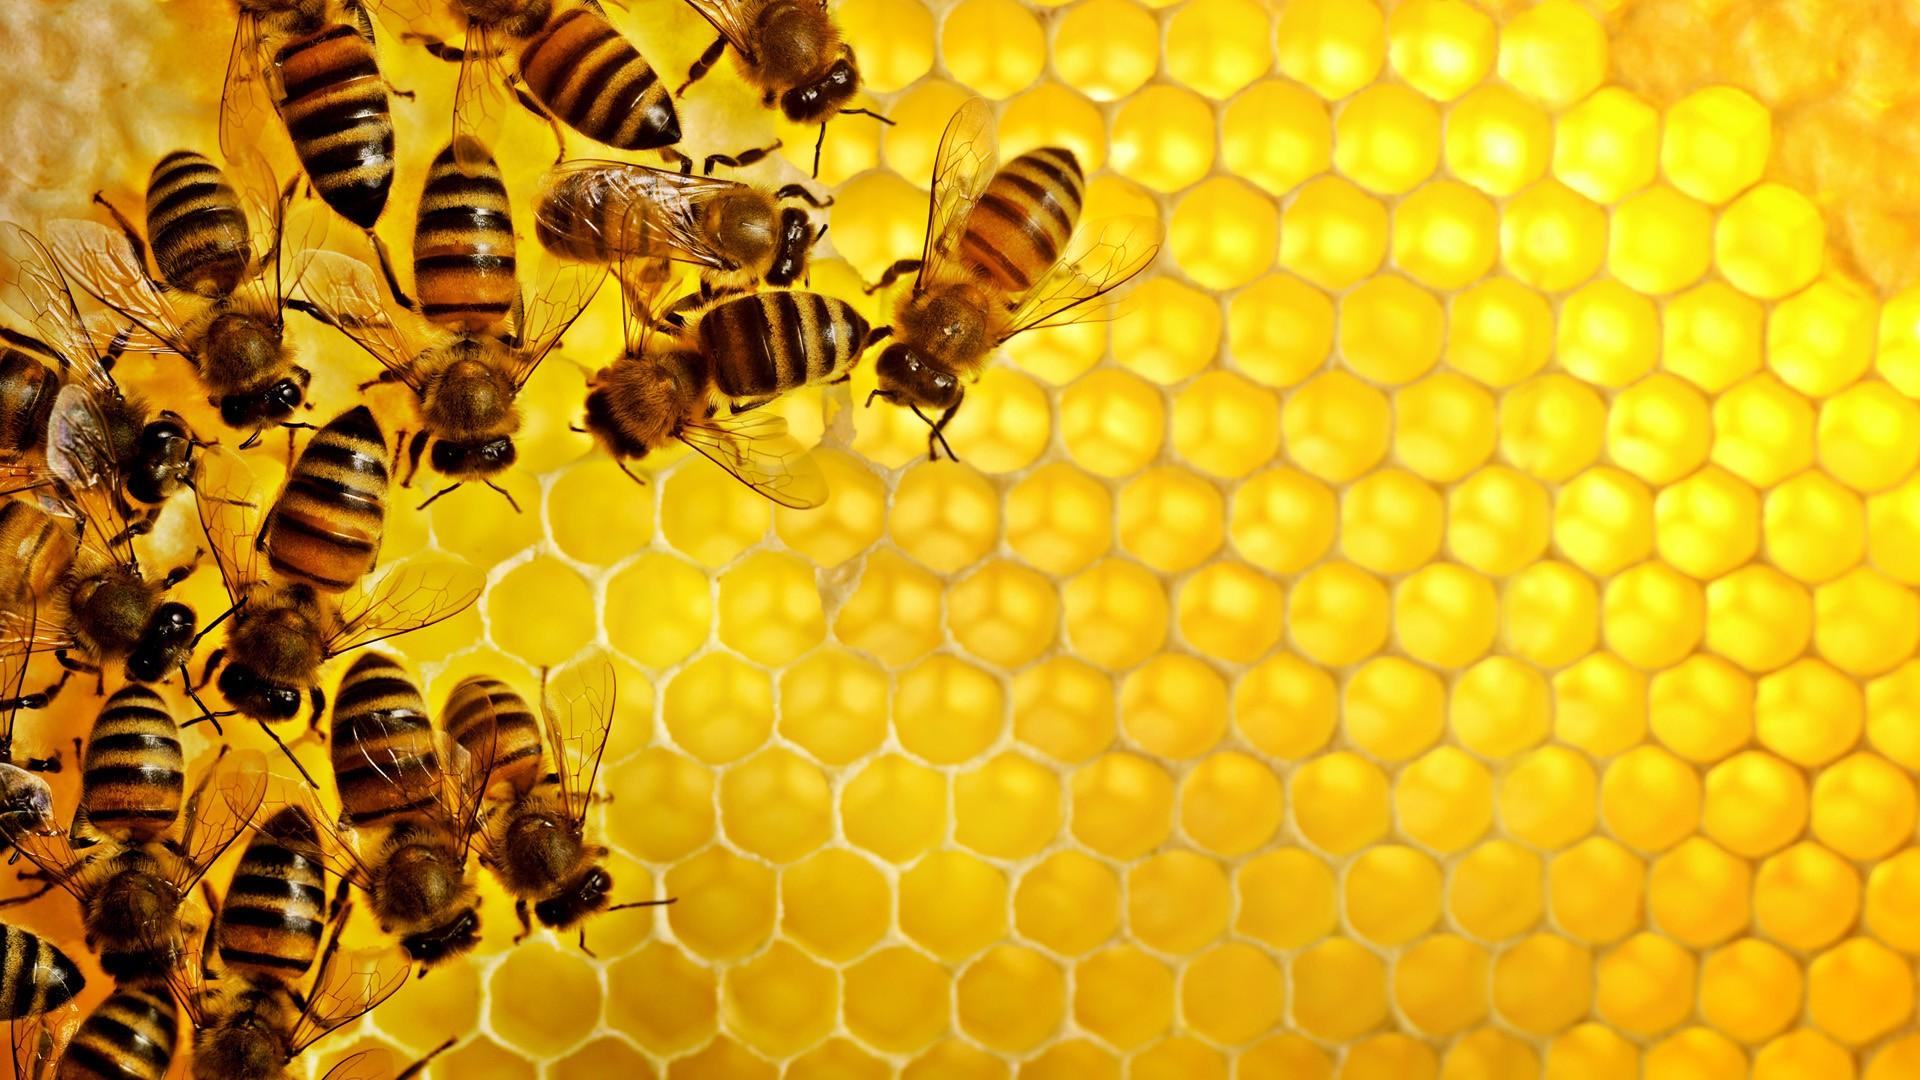 Download Sweden Honey Wallpaper 1920x1080 Wallpoper 390082 1920x1080